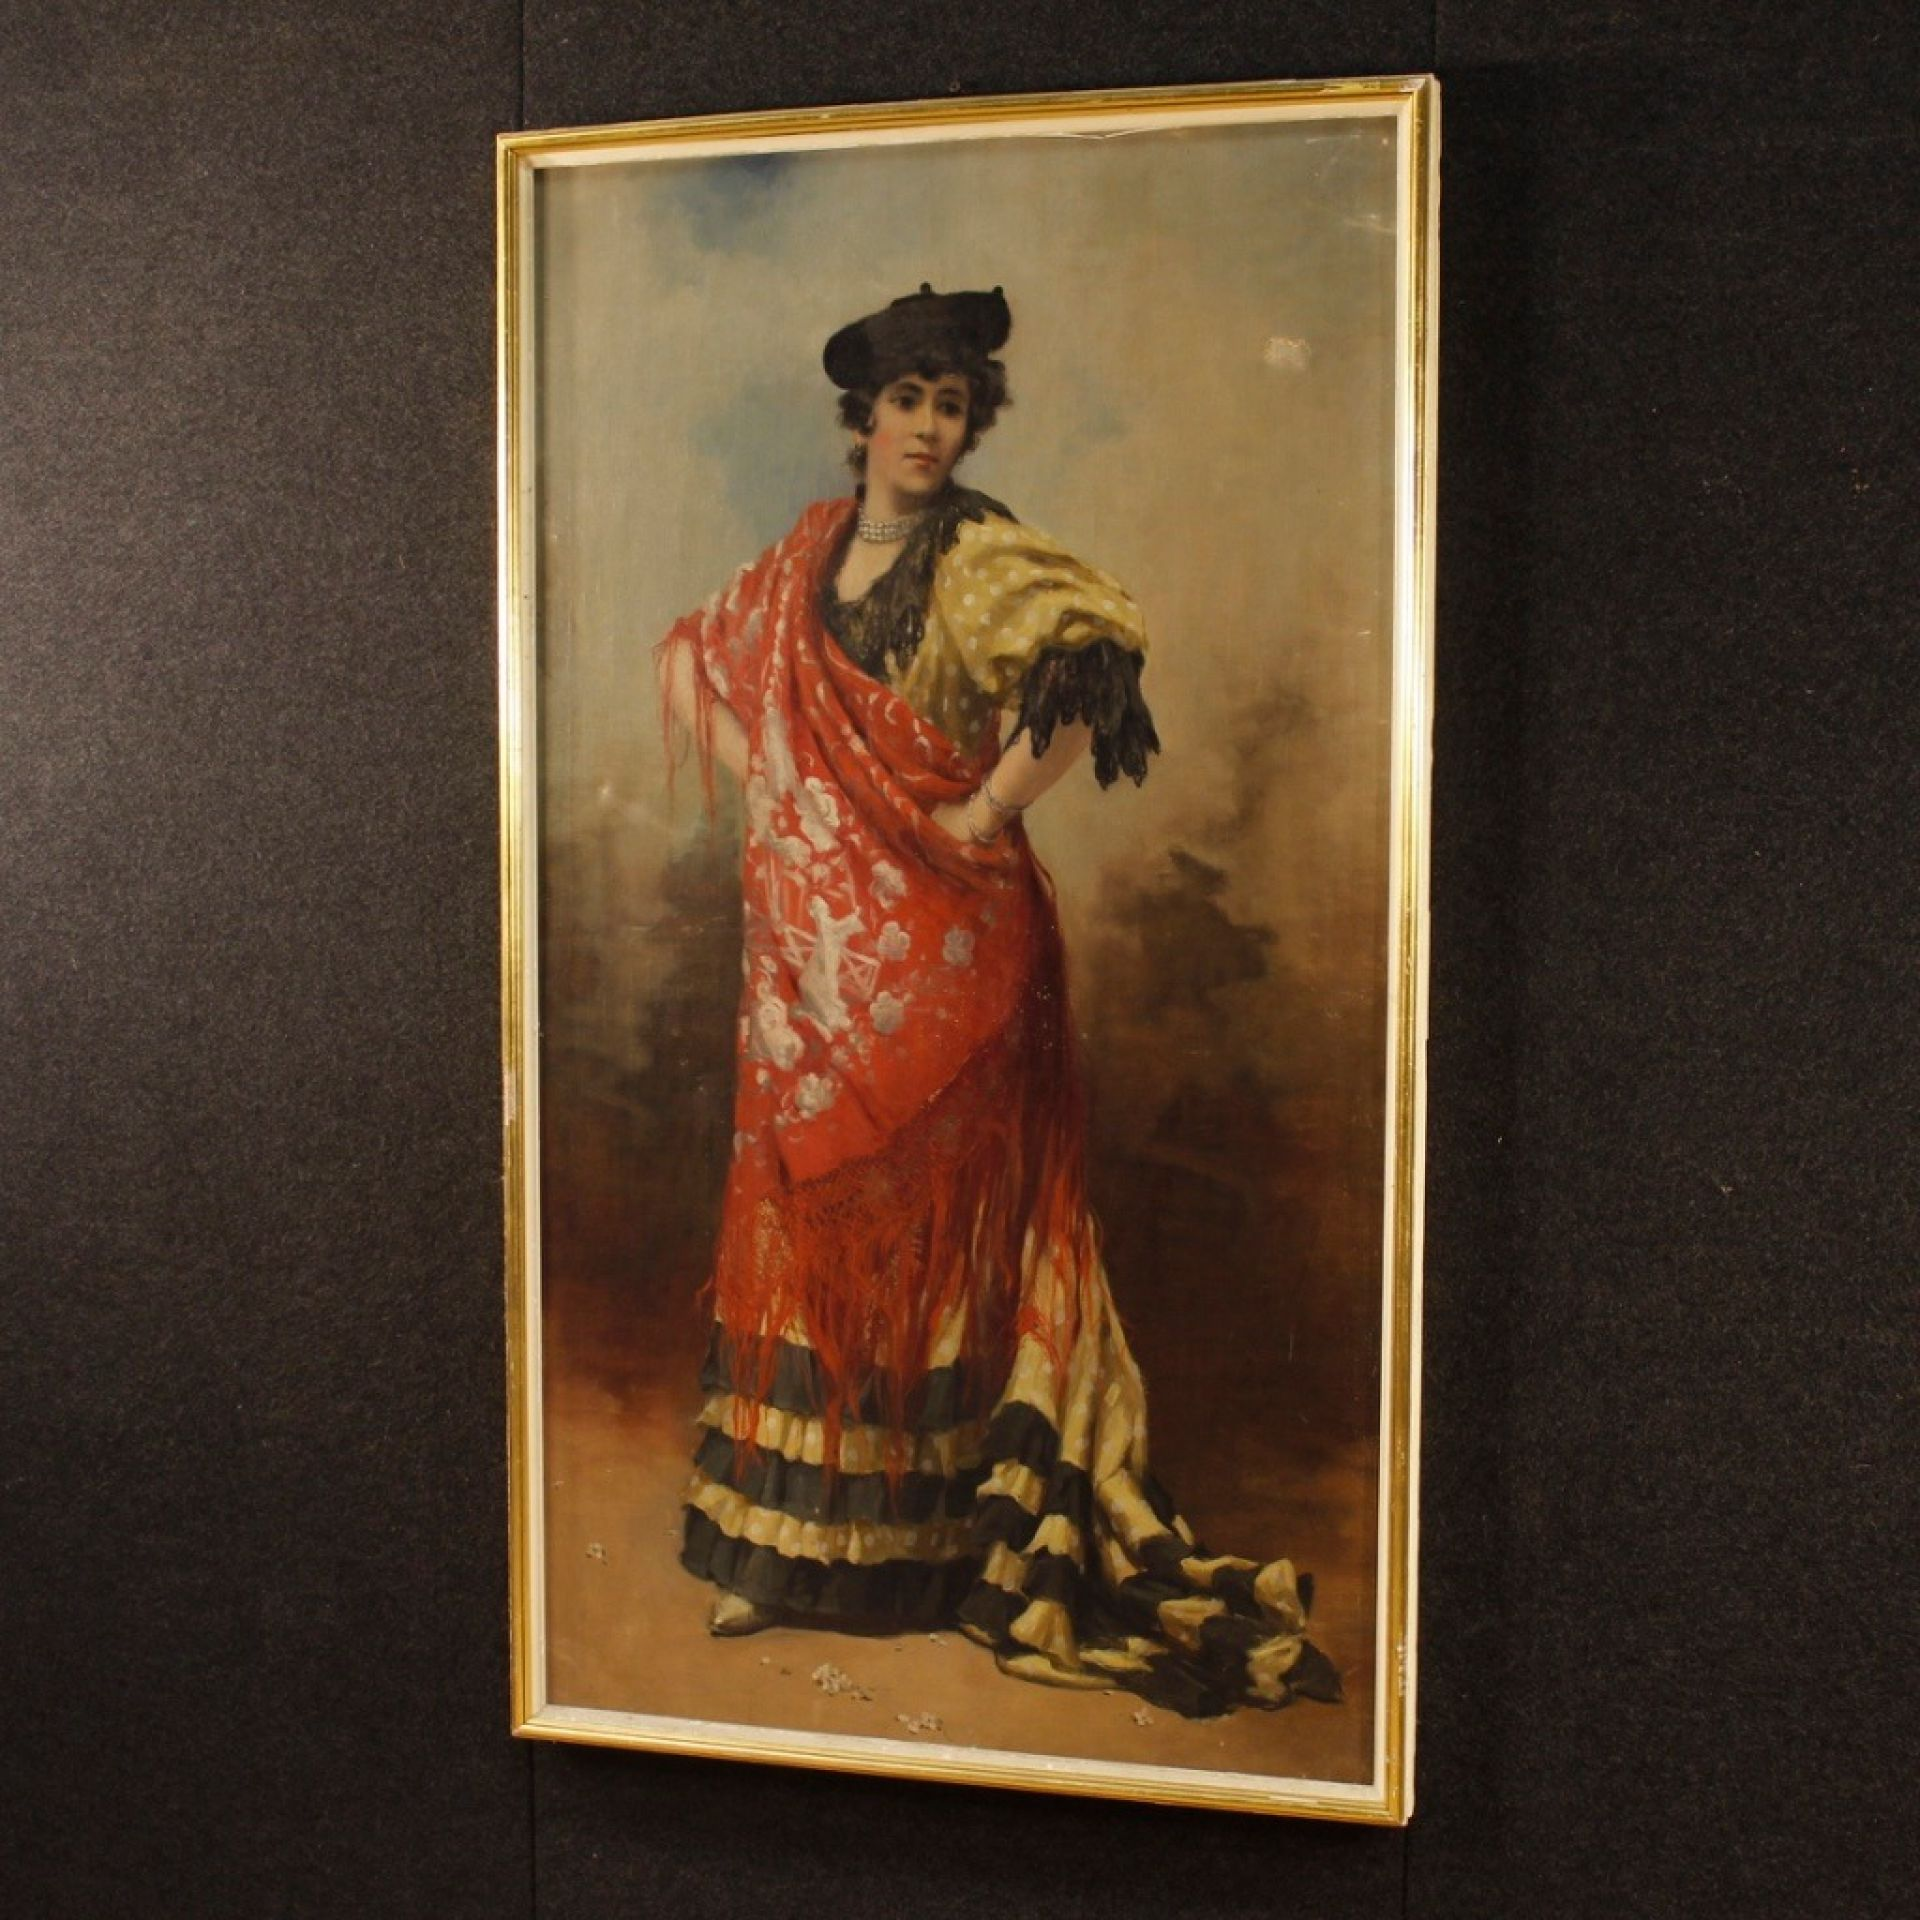 19th Century Oil On Canvas Spanish Dancer Portrait Painting, 1890